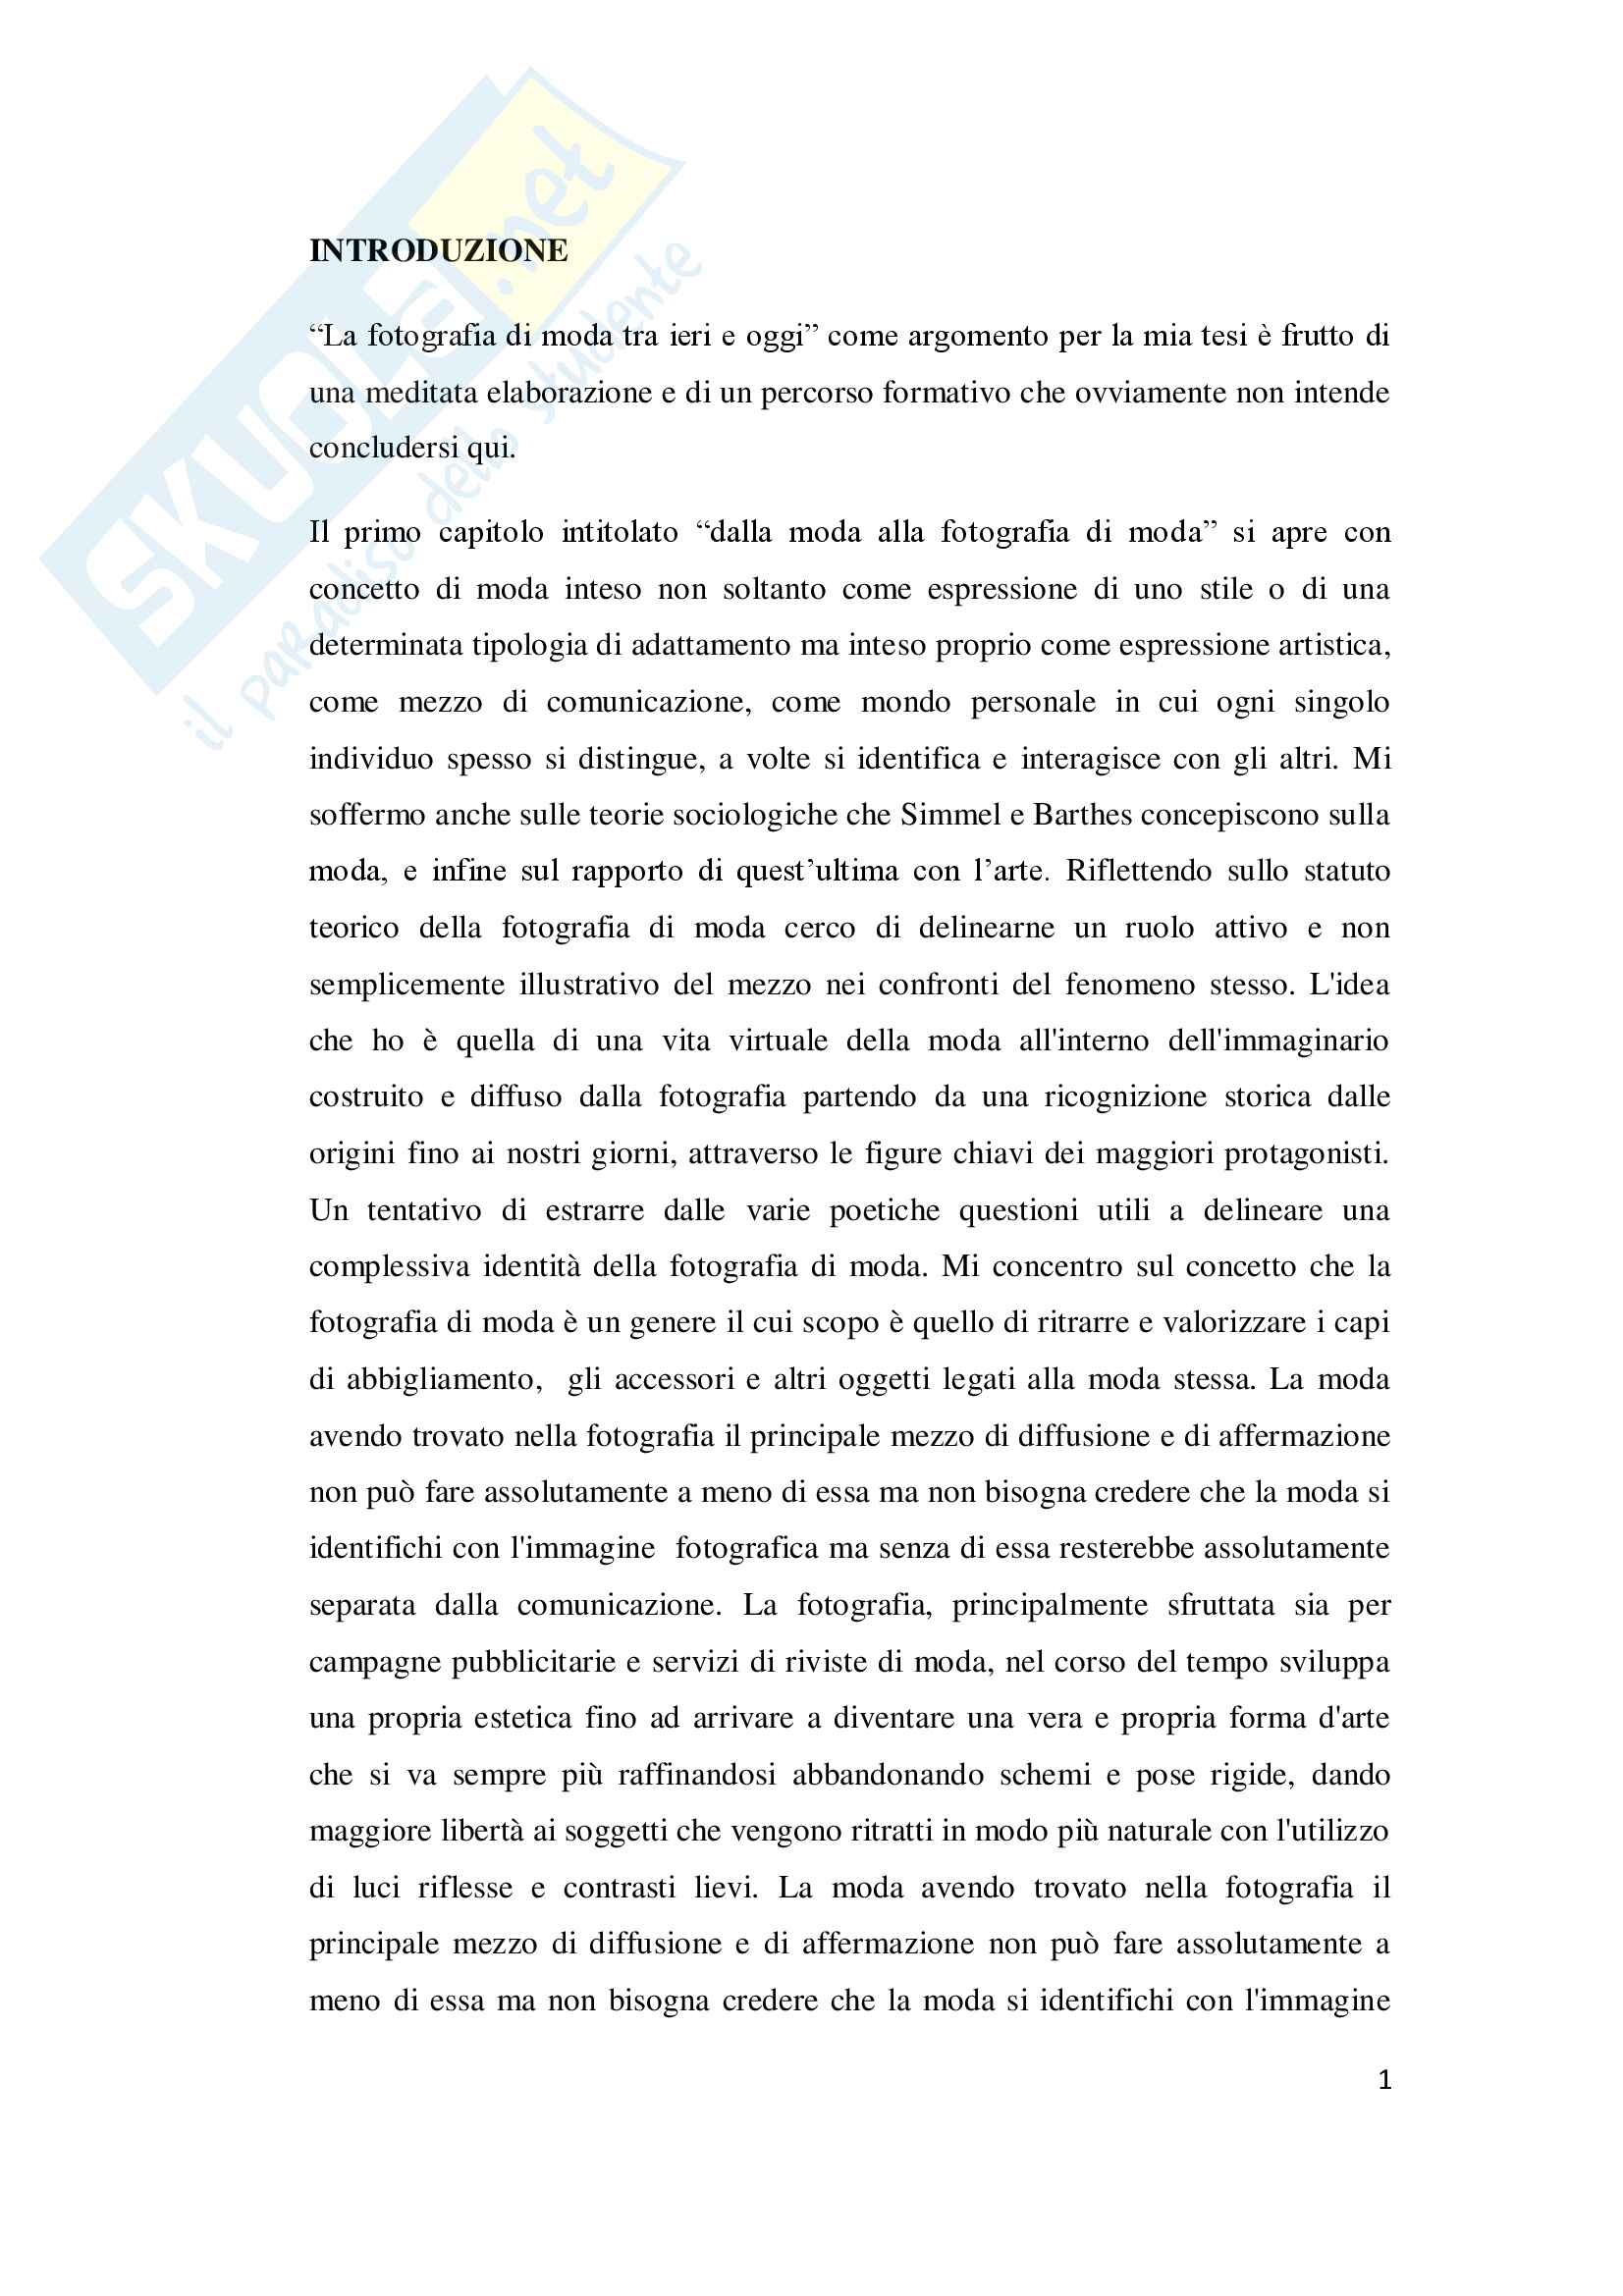 tesi F. Parisi Fotografia di moda